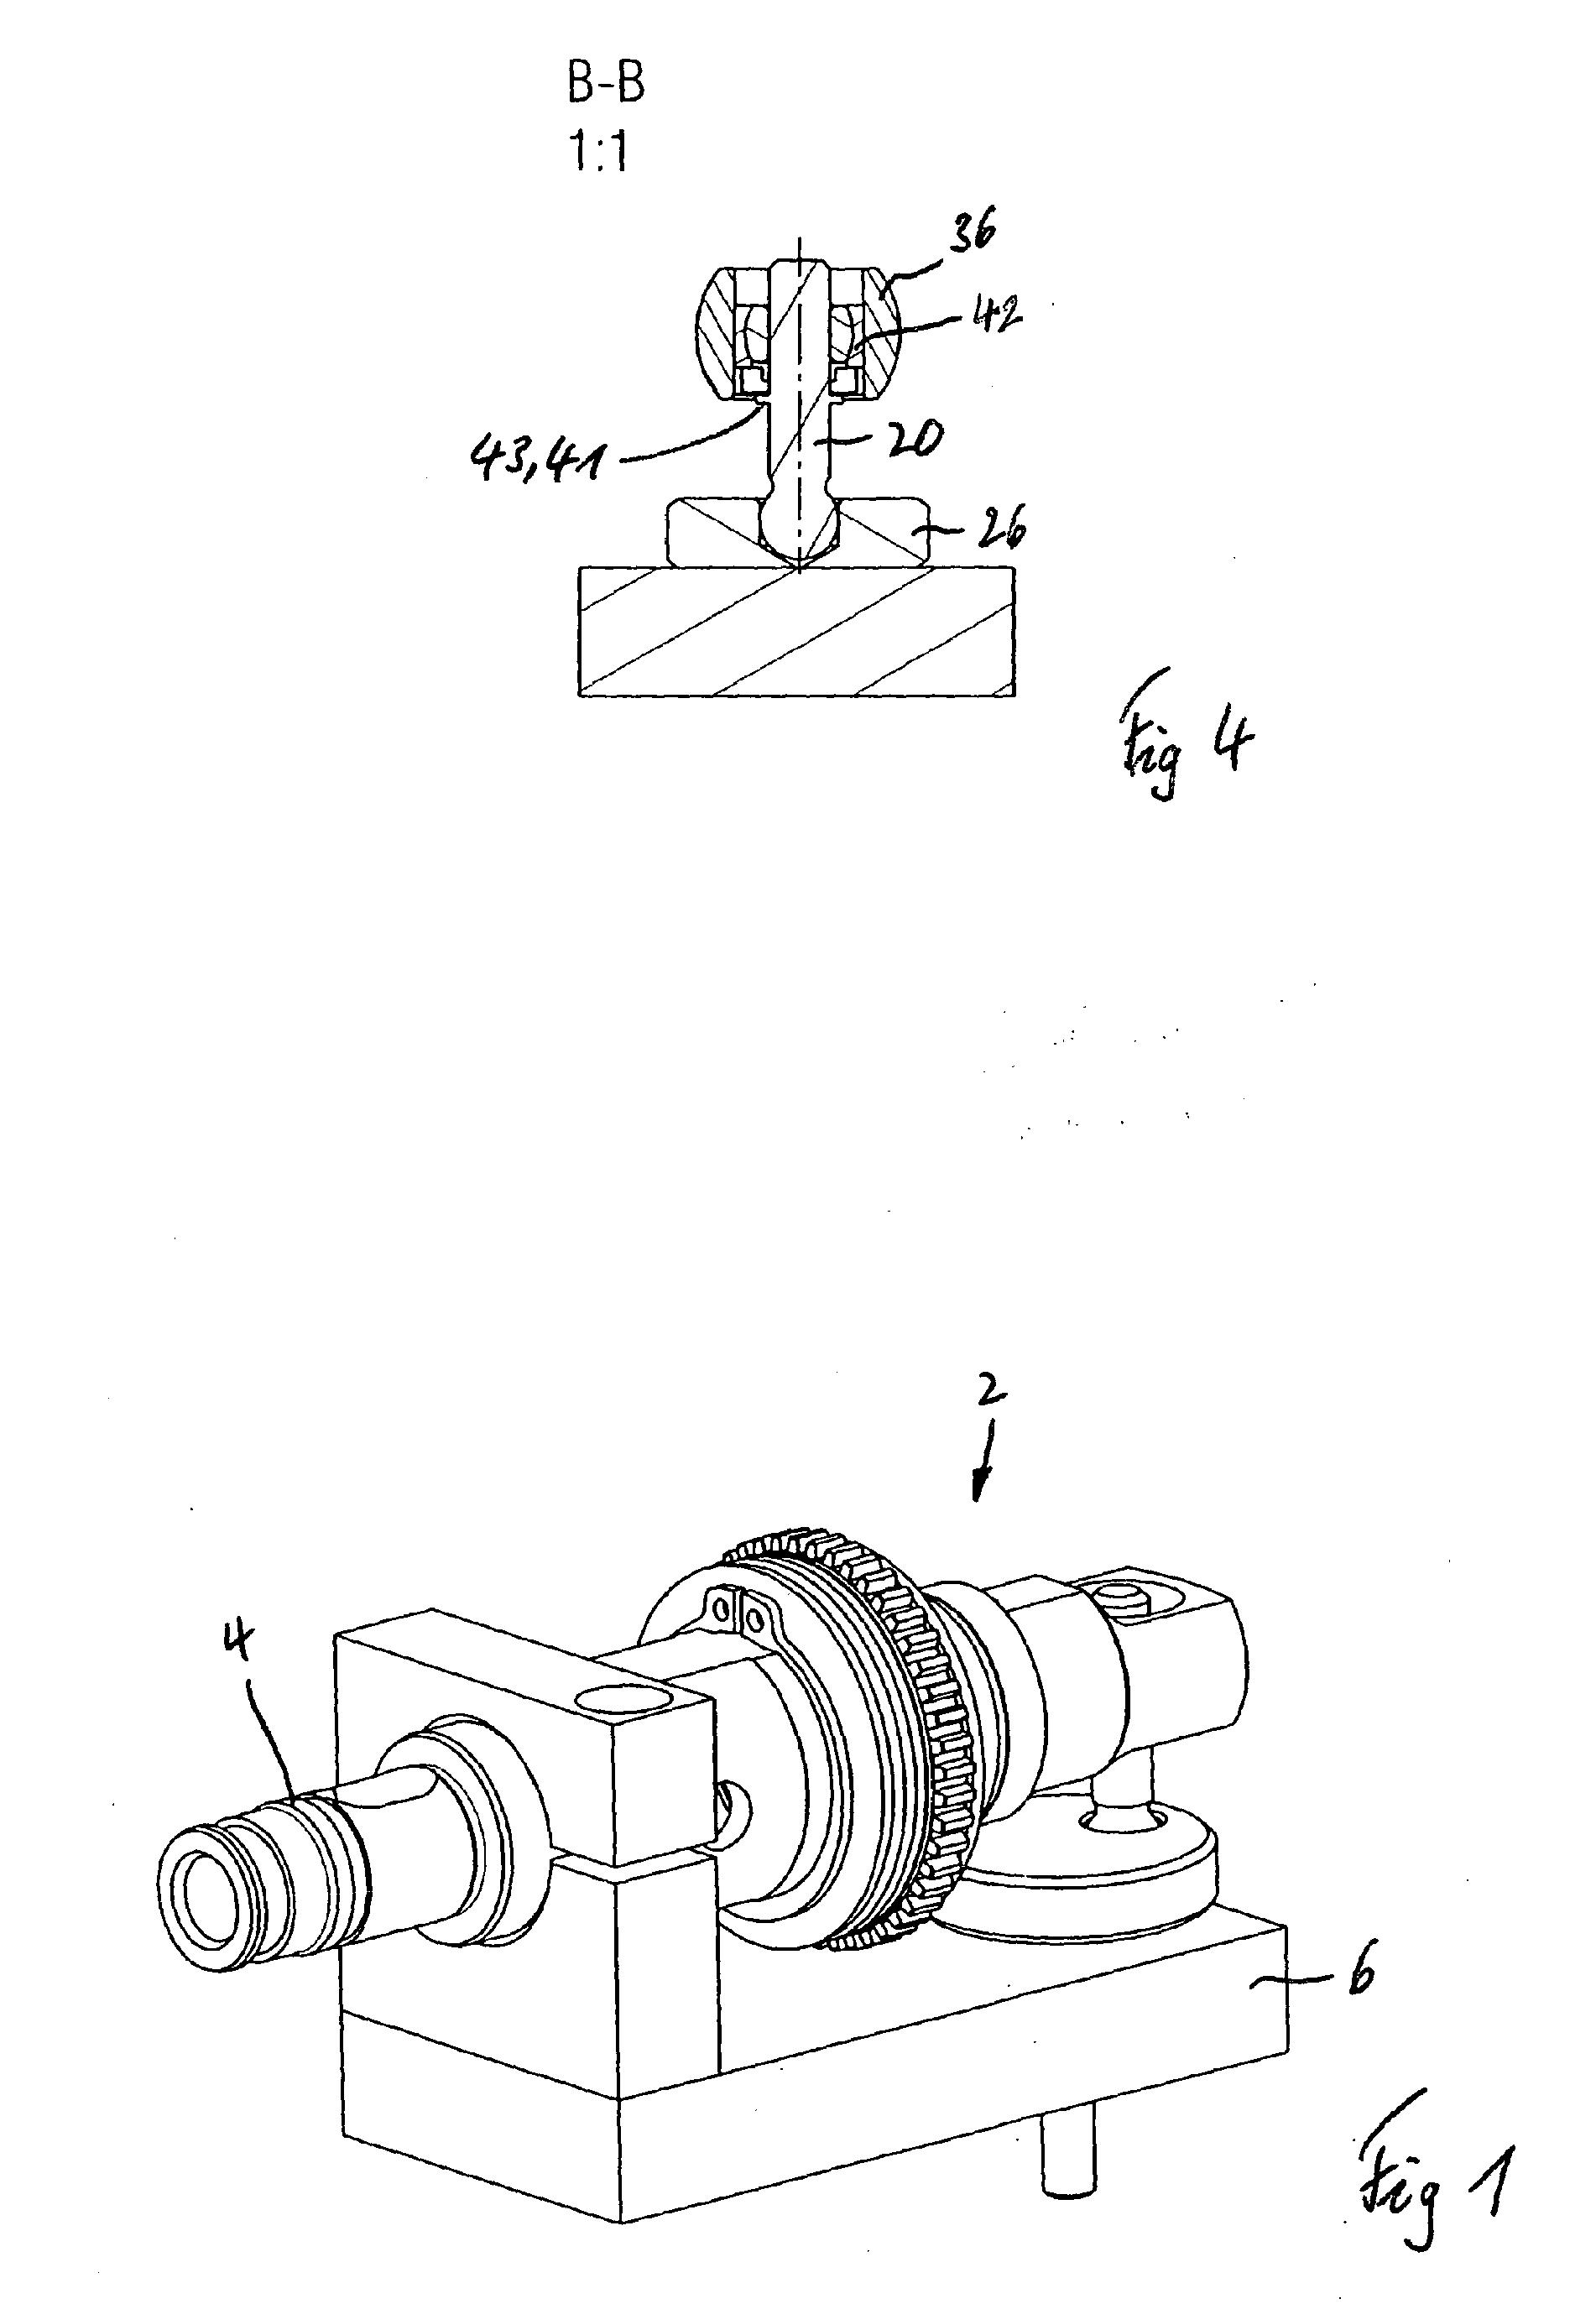 patent ep1949992a1 motorisch angetriebener bohrhammer. Black Bedroom Furniture Sets. Home Design Ideas